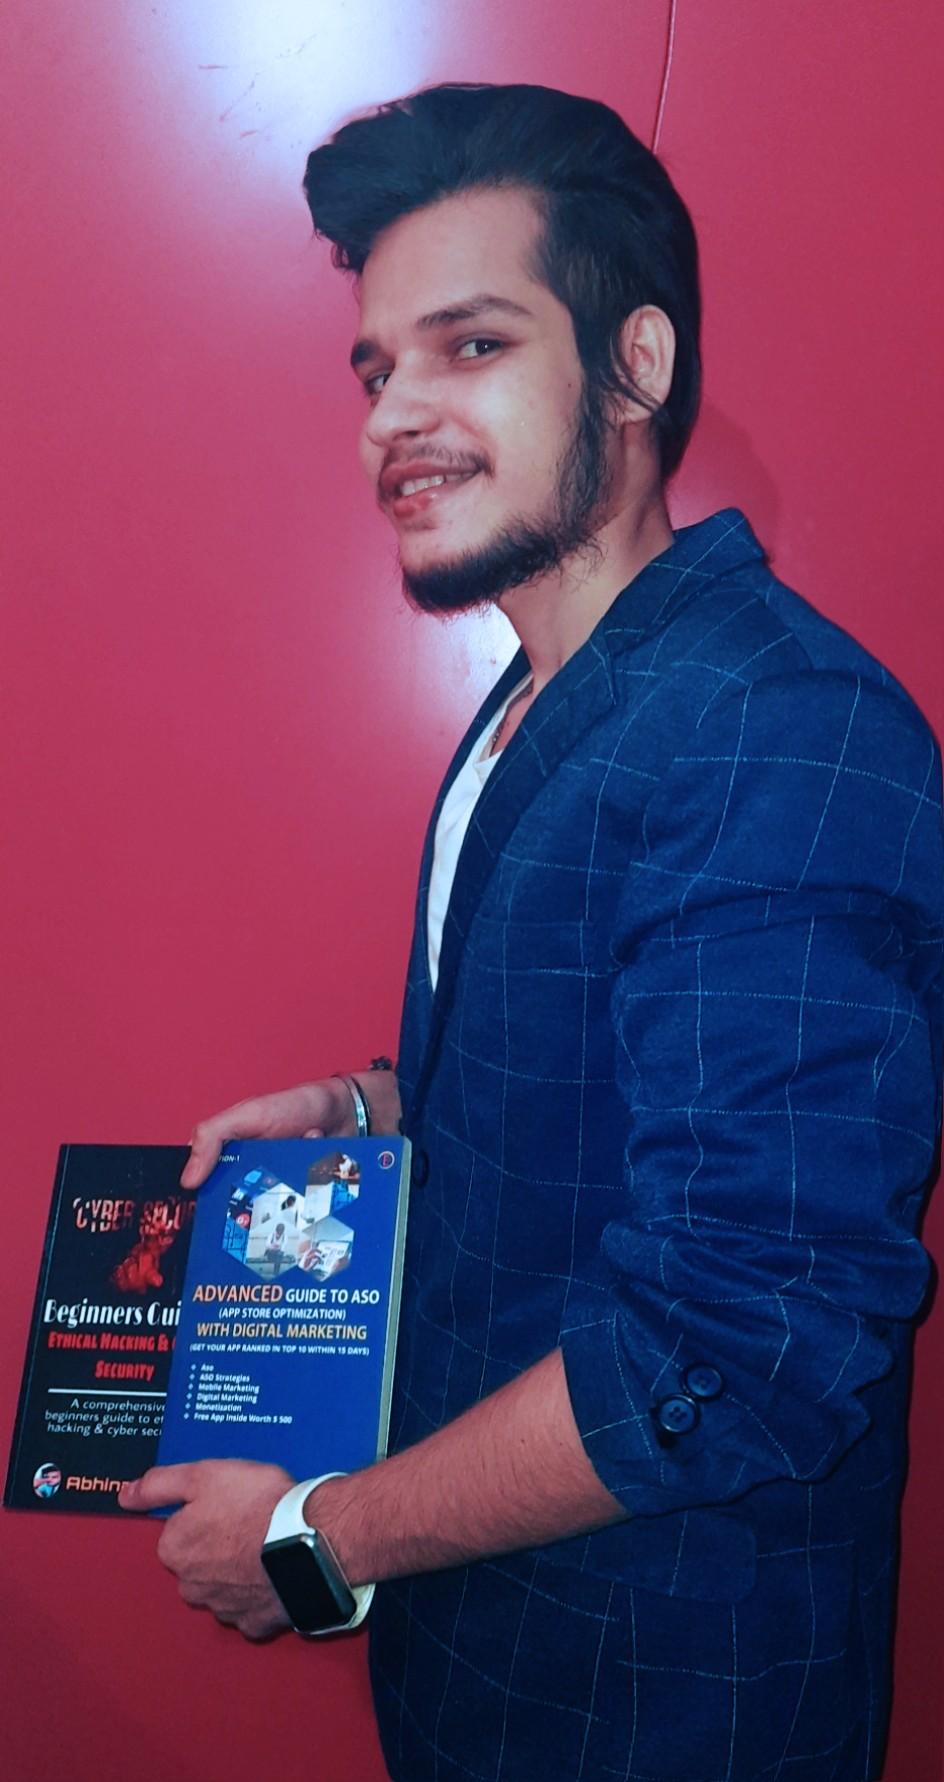 Abhinav Ojha - The passionate Digital entreprenuer